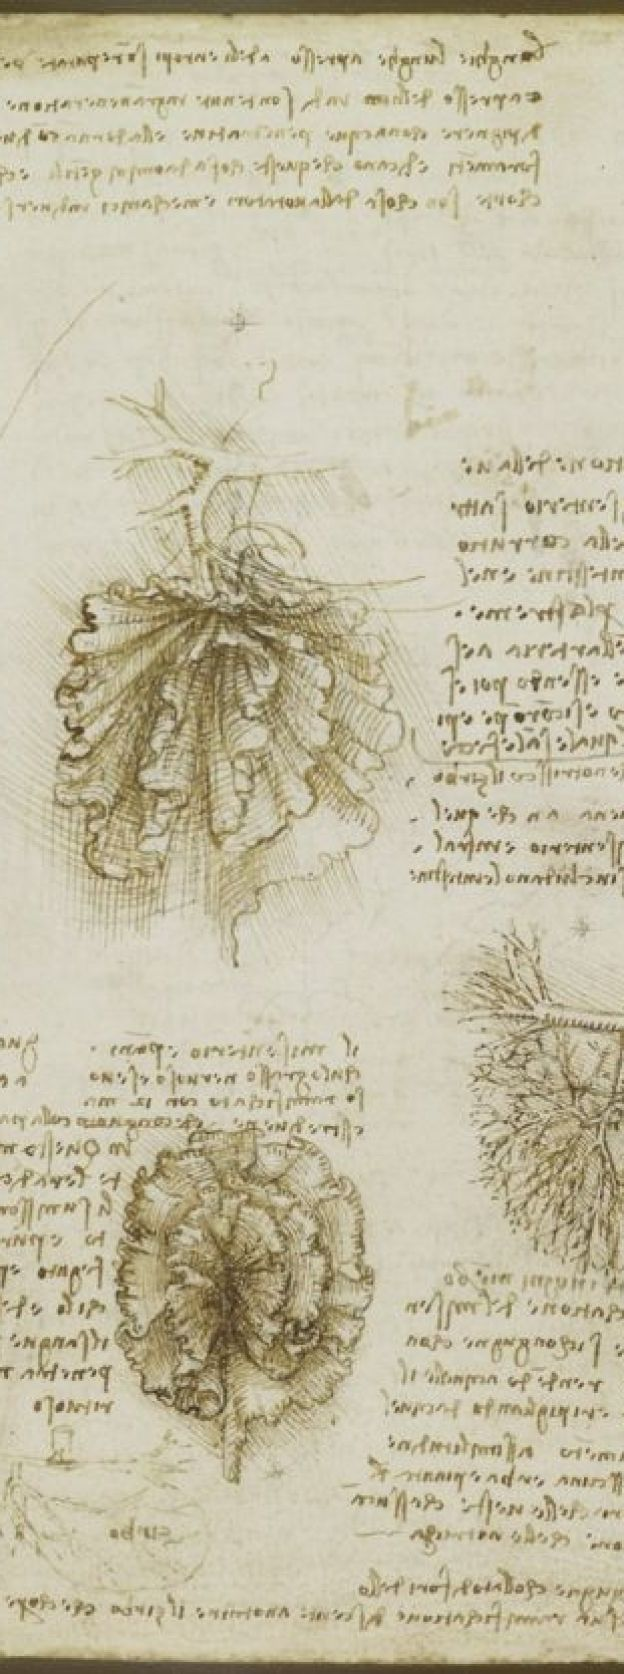 Boceto de Leonardo Da Vinci. Royal Collection Trust/© Her Majesty Queen Elizabeth II 2017